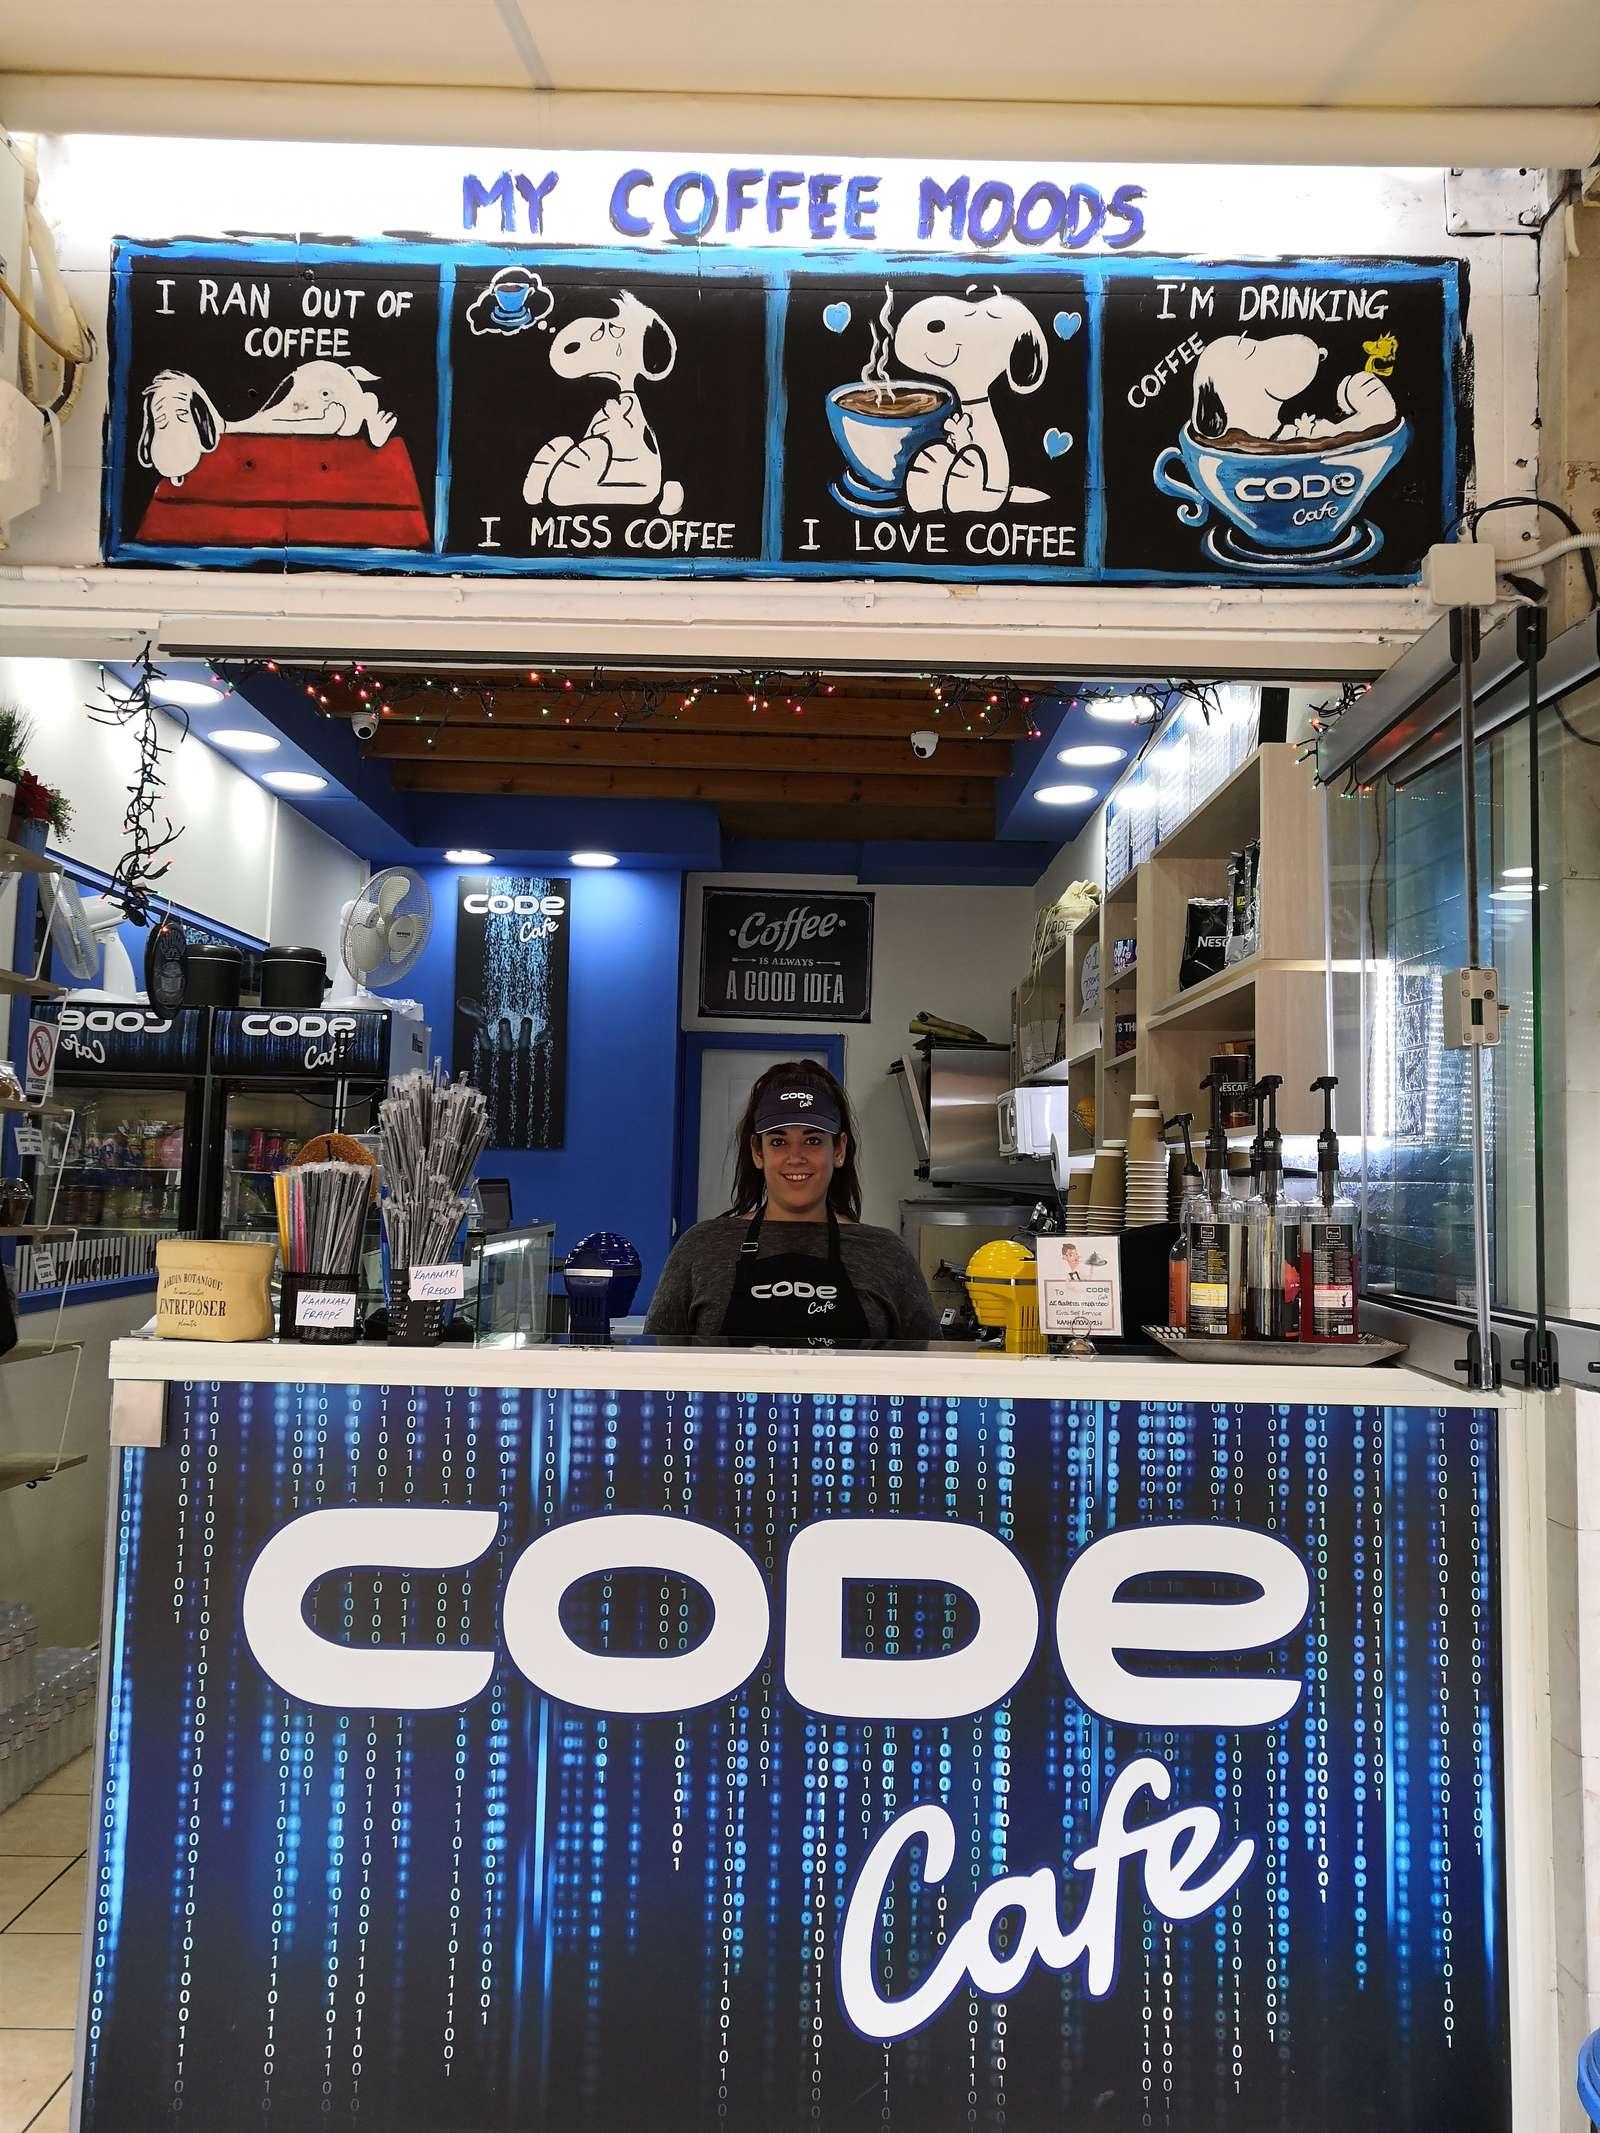 Code cafe